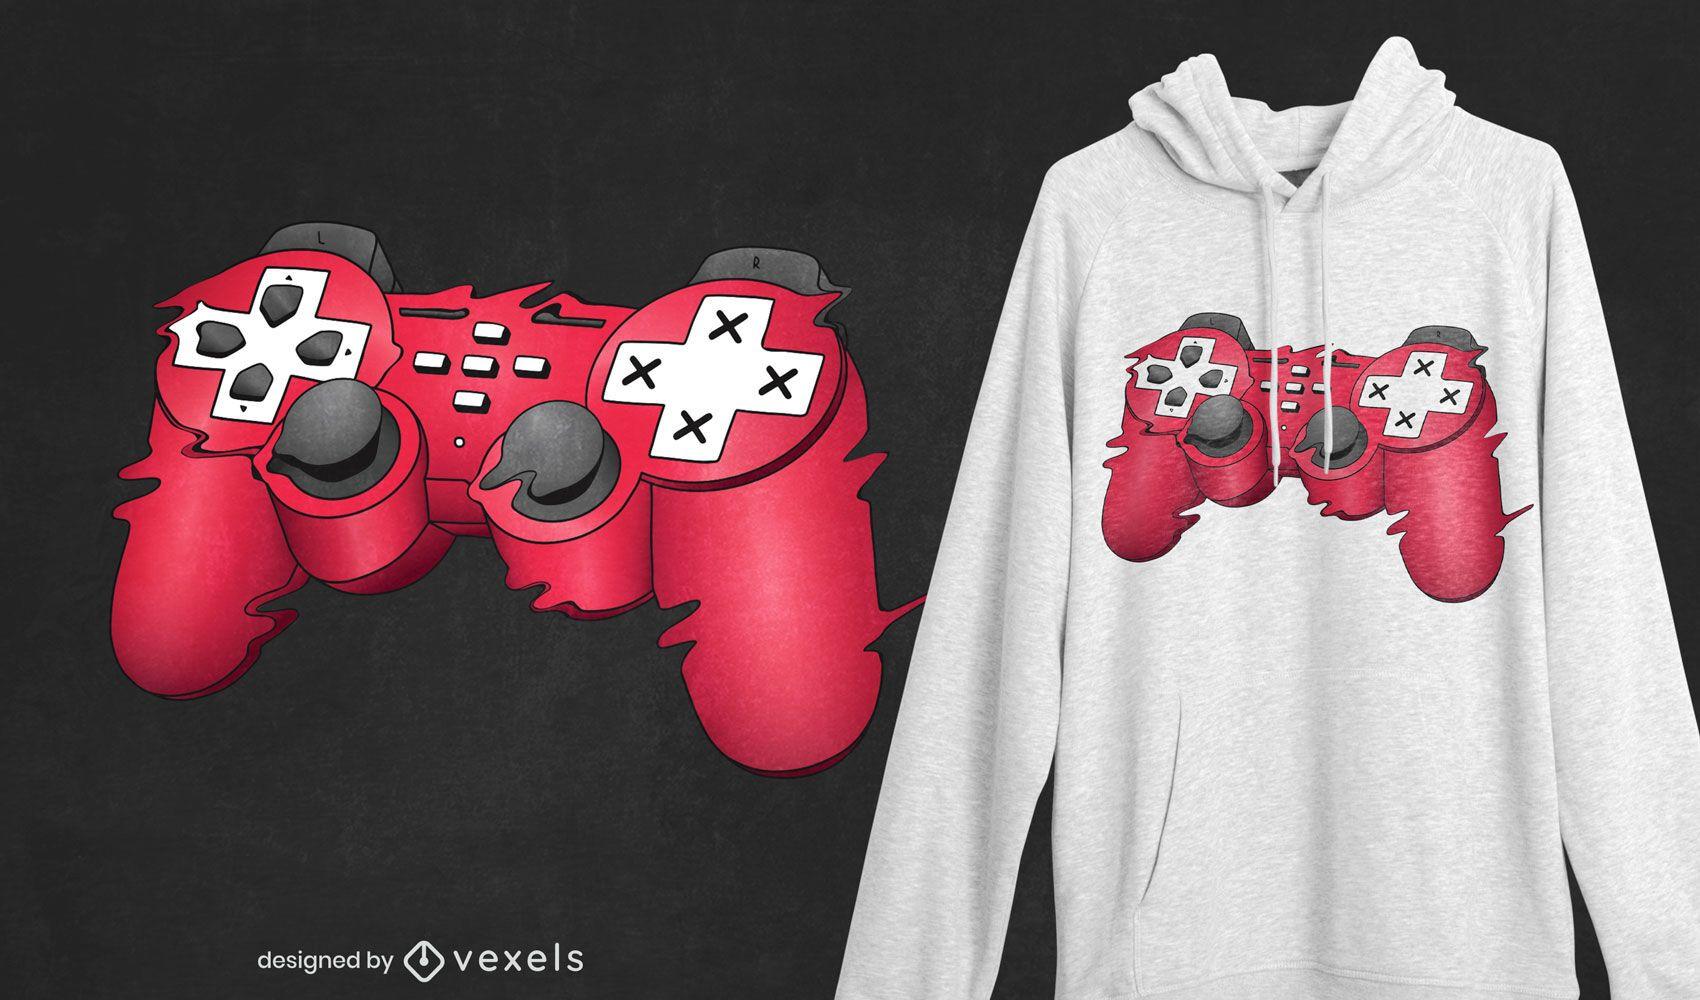 Glitchy joystick t-shirt design